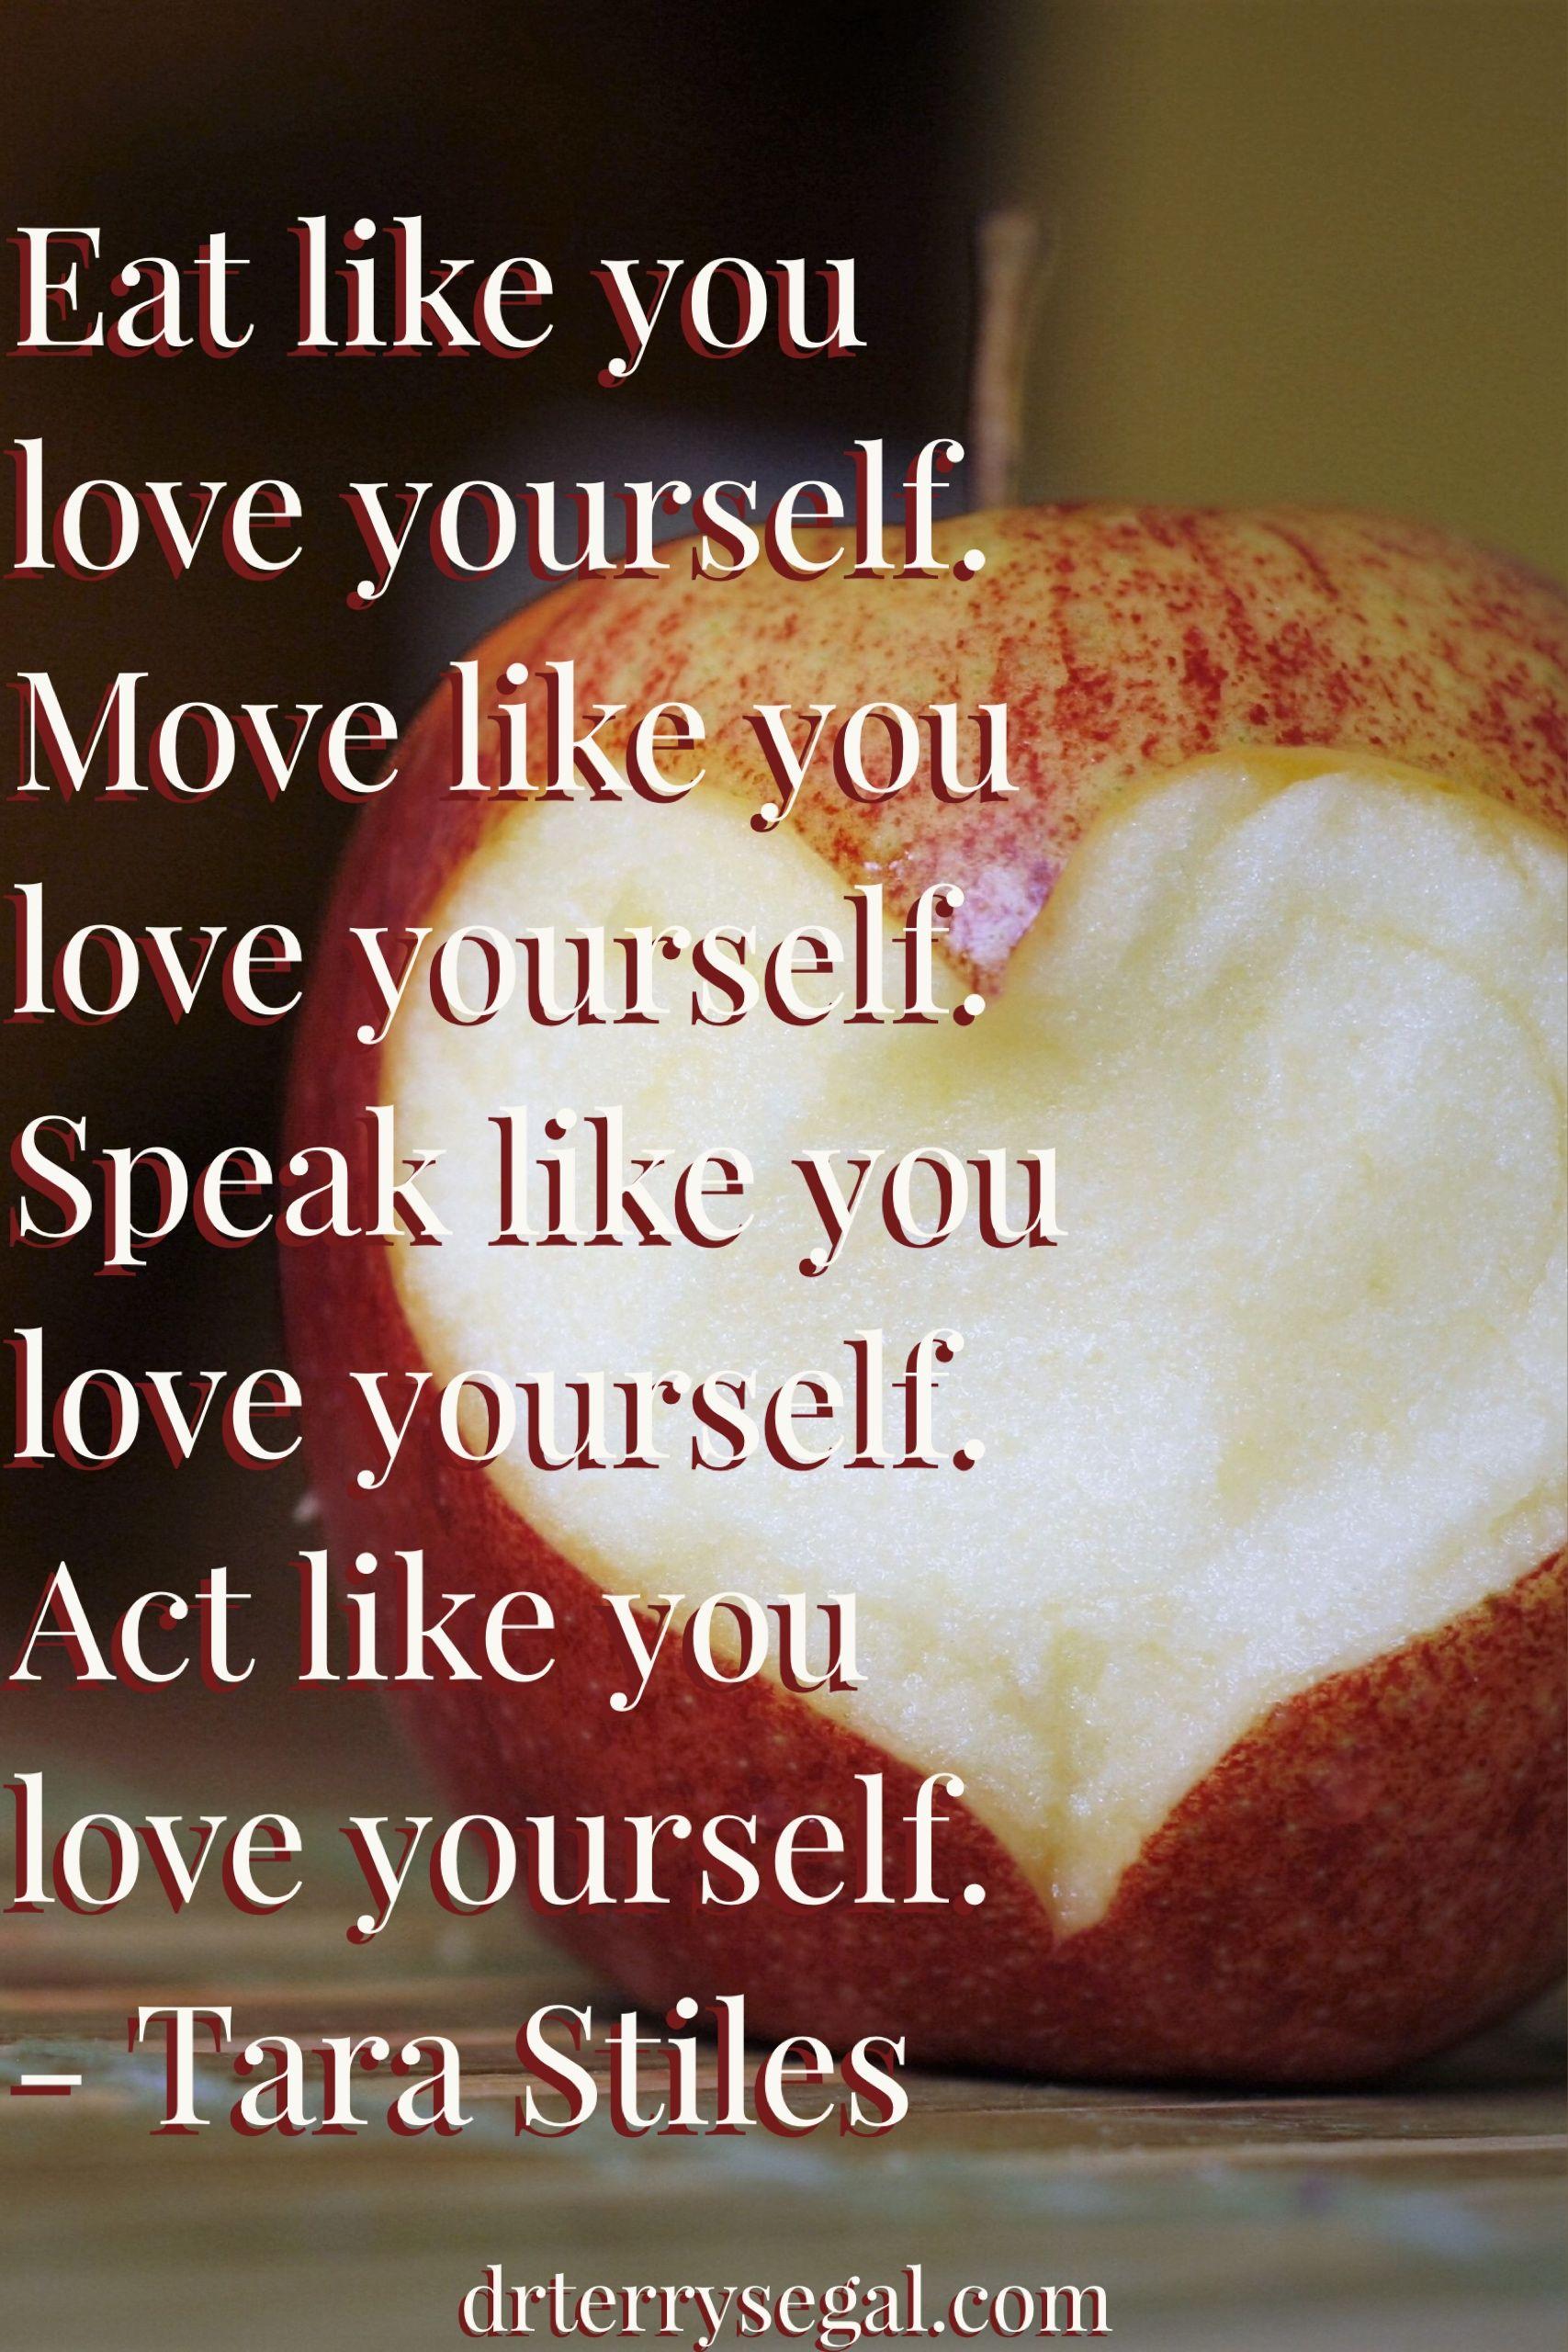 Retreat From Stress Eat Like You Love Yourself Move Like You Love